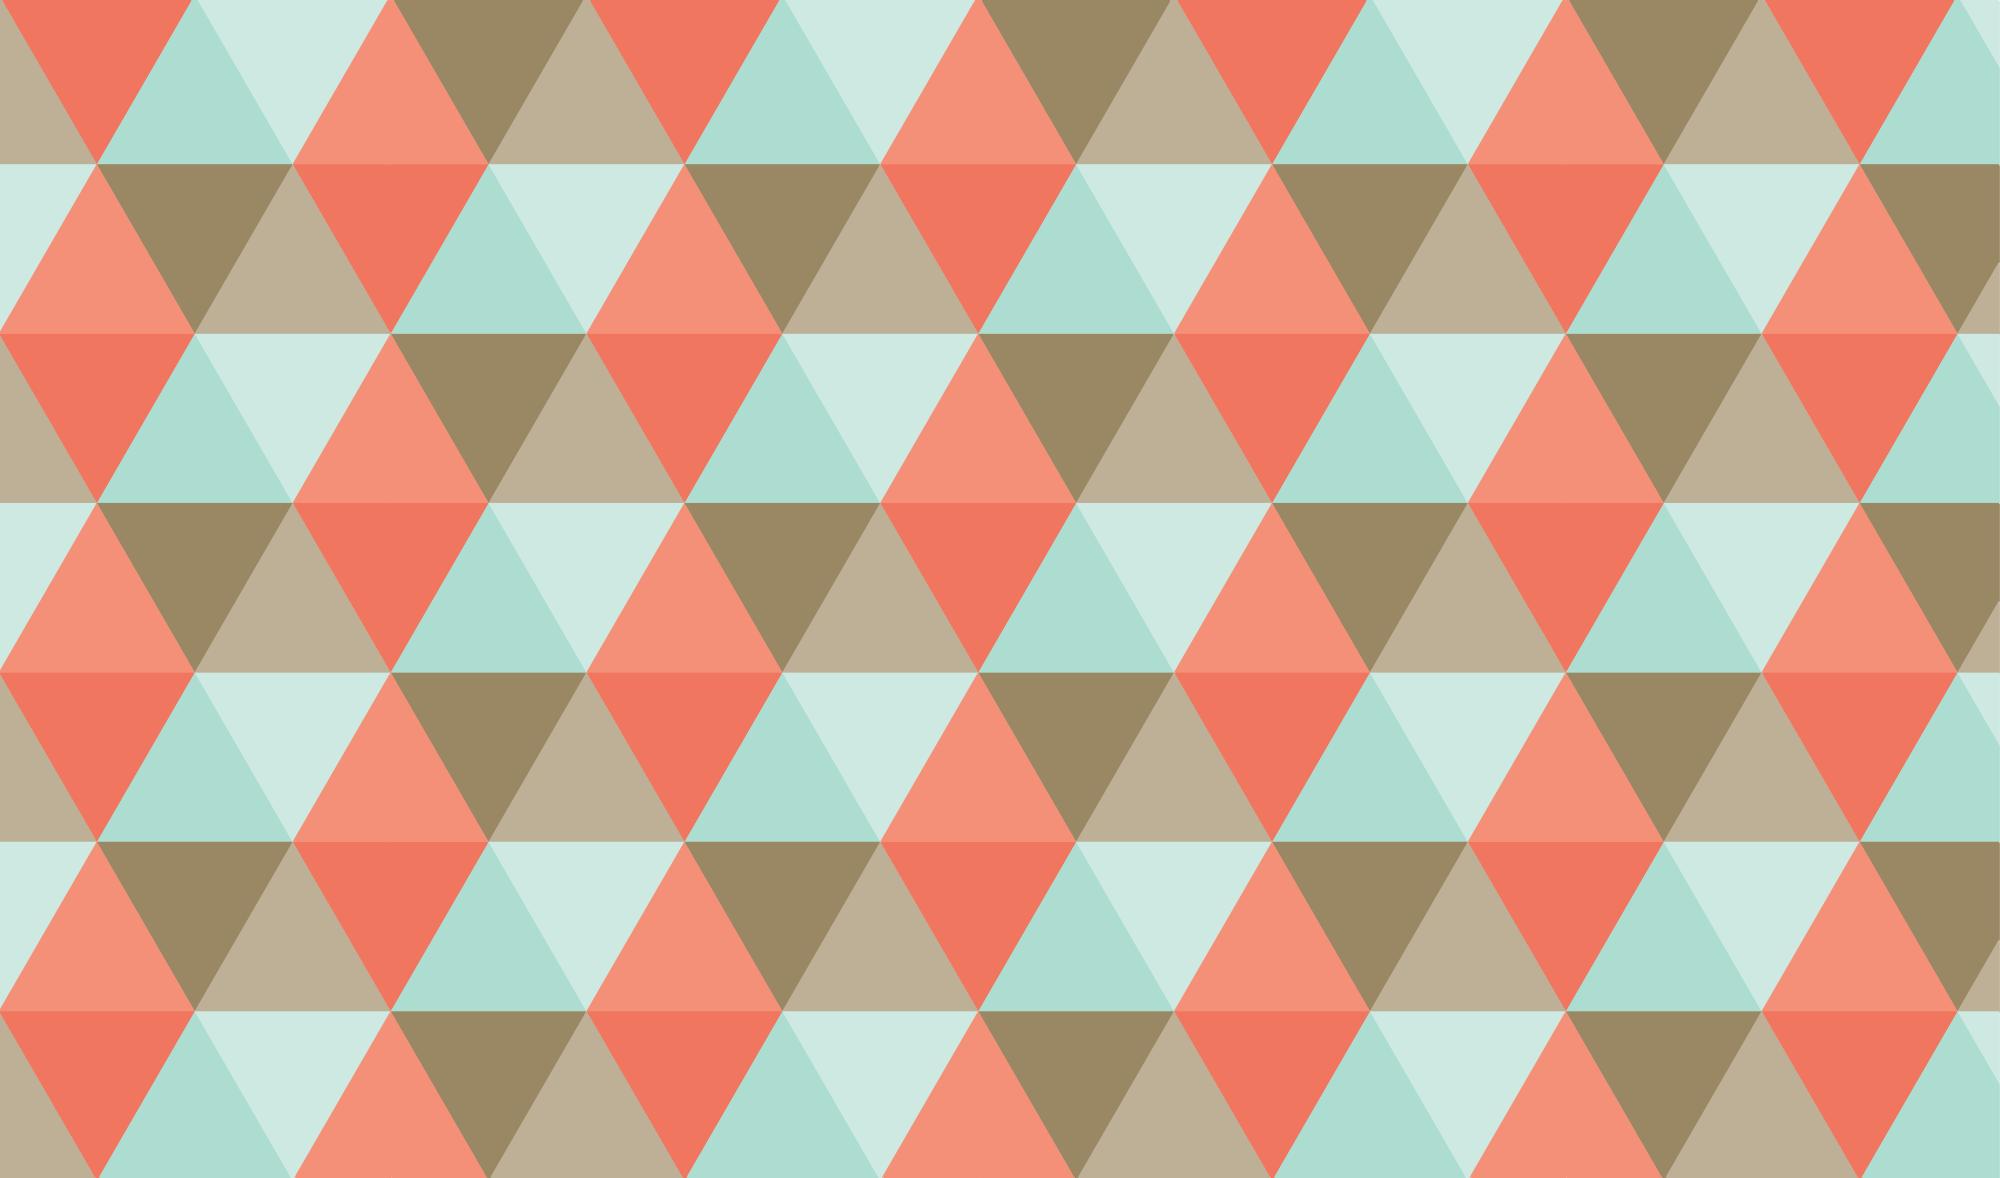 Perkse pattern